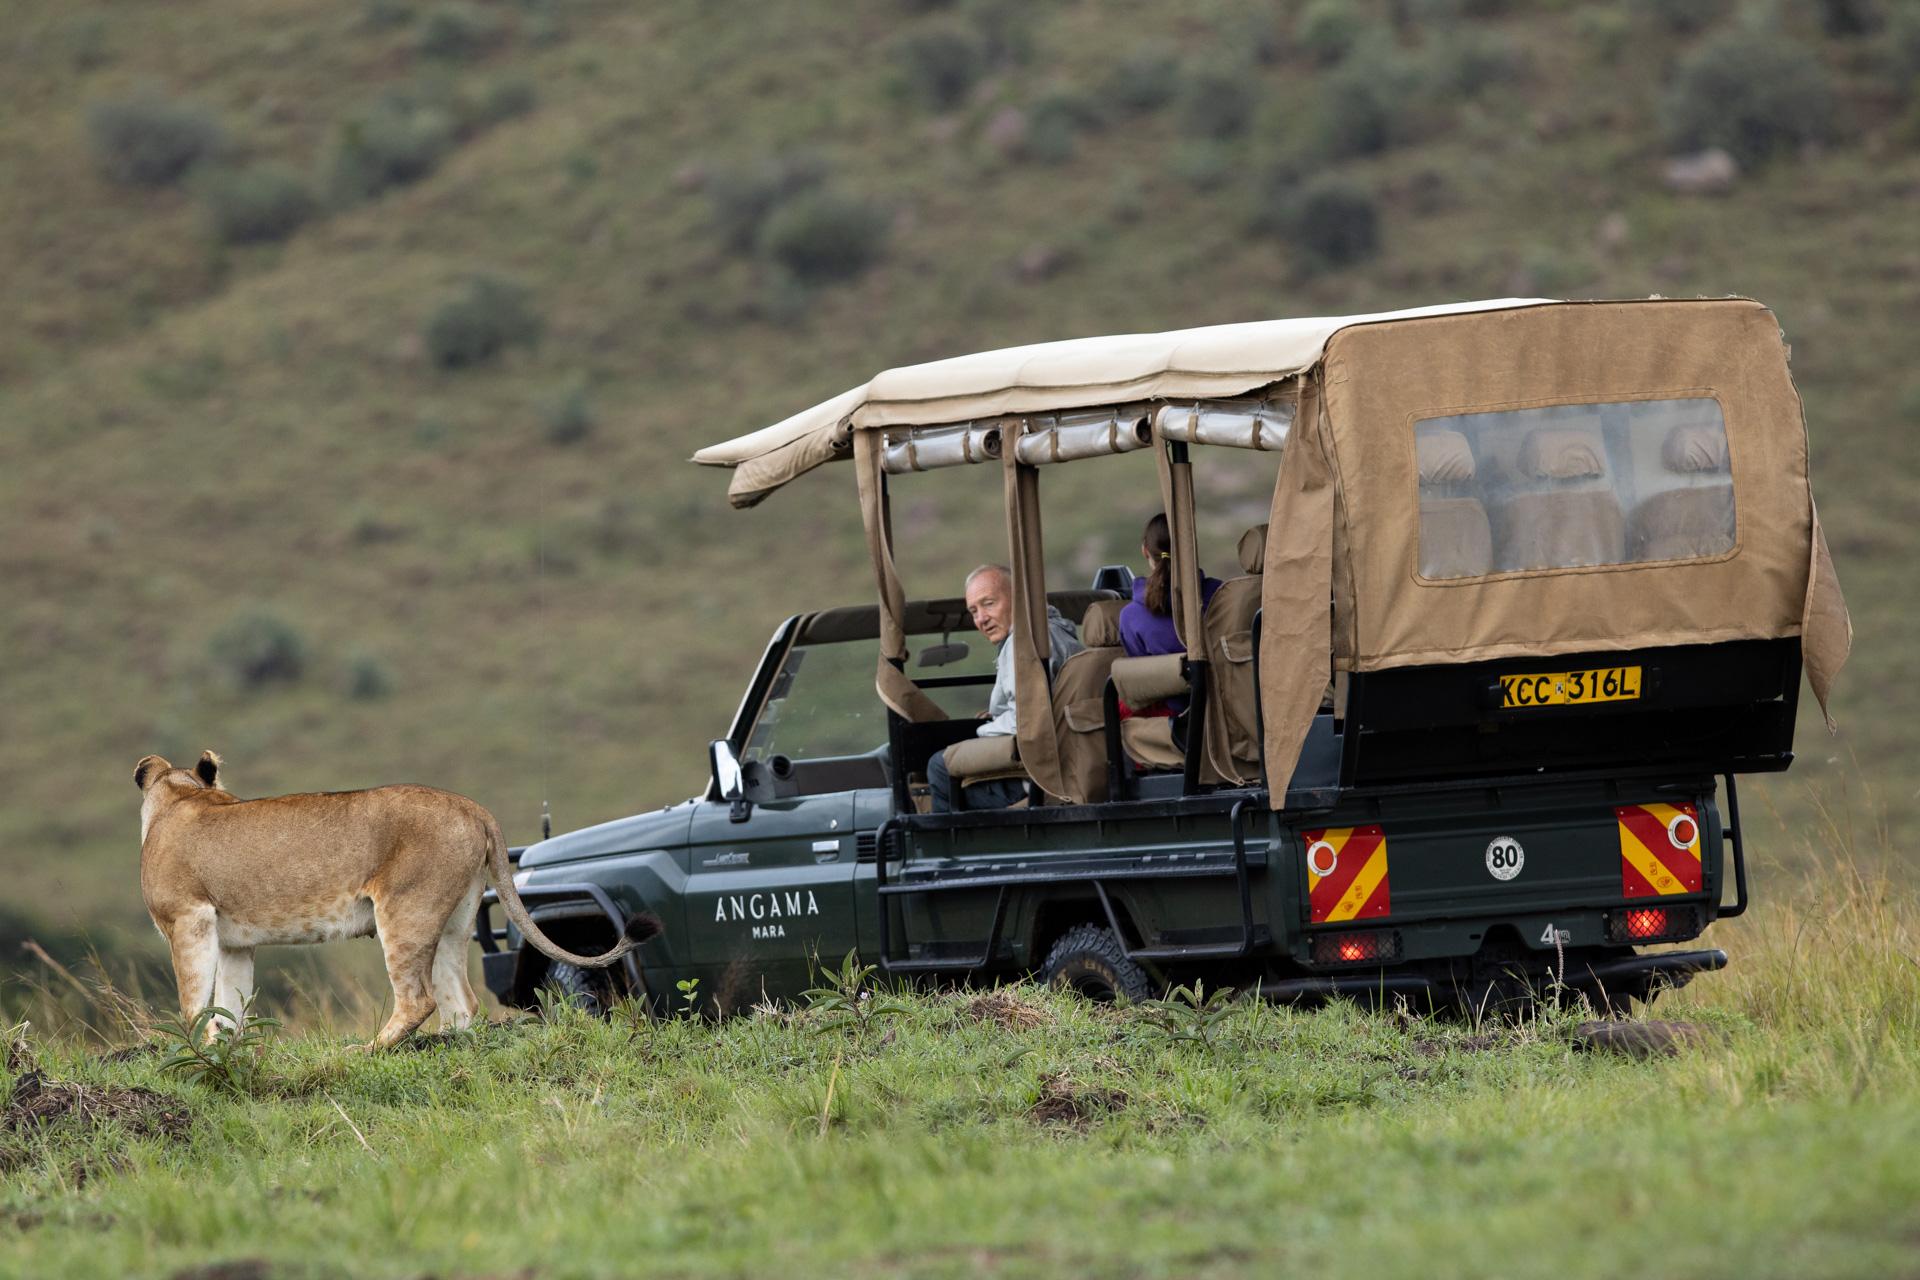 Lion and Angama vehicle